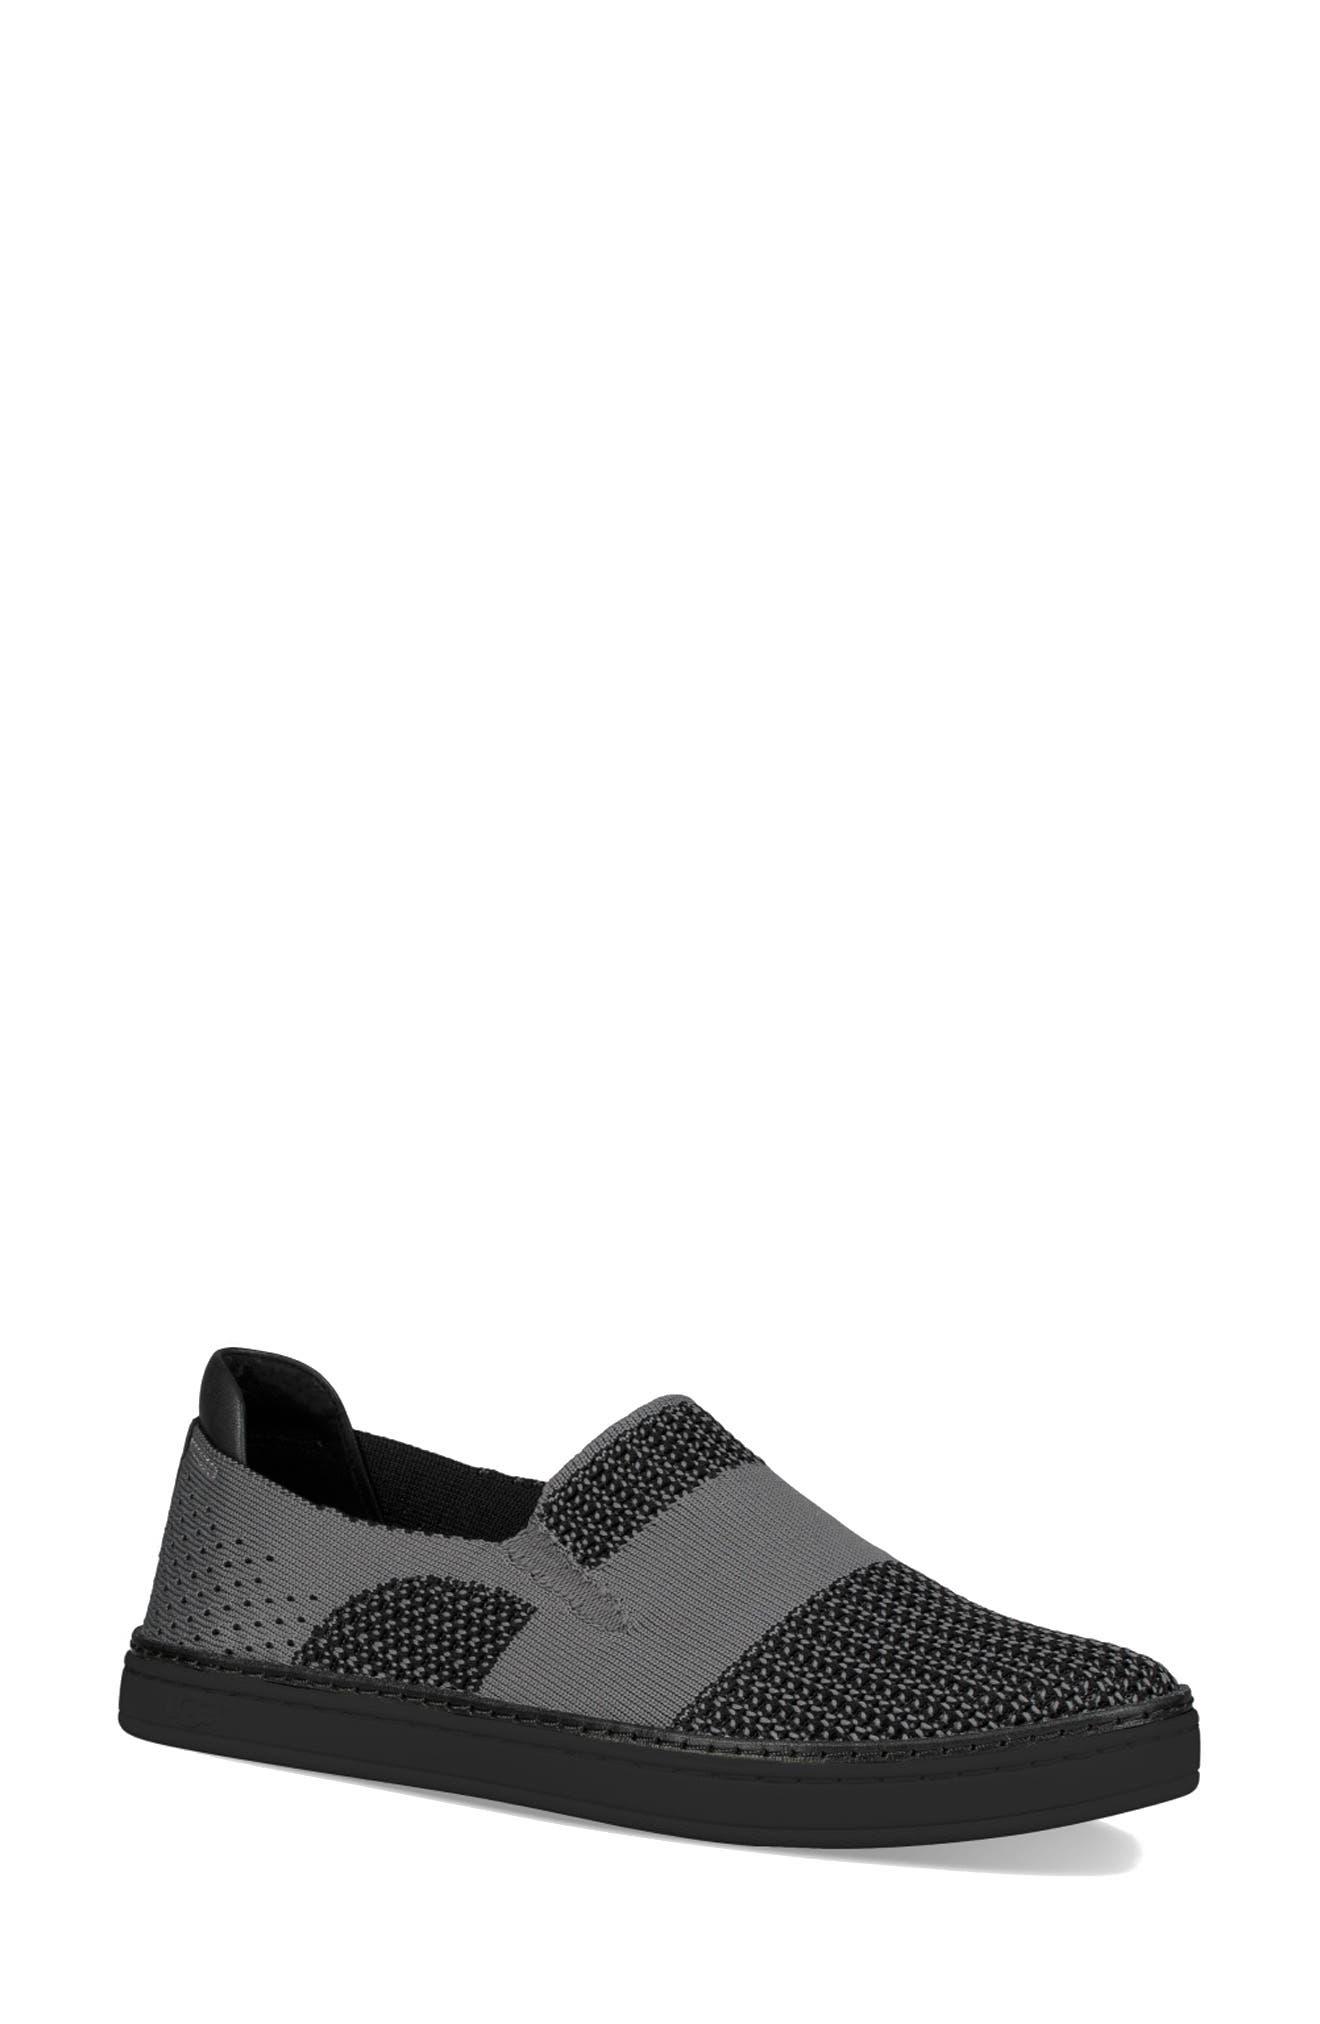 Sammy Sneaker,                         Main,                         color, Black/ Black Fabric